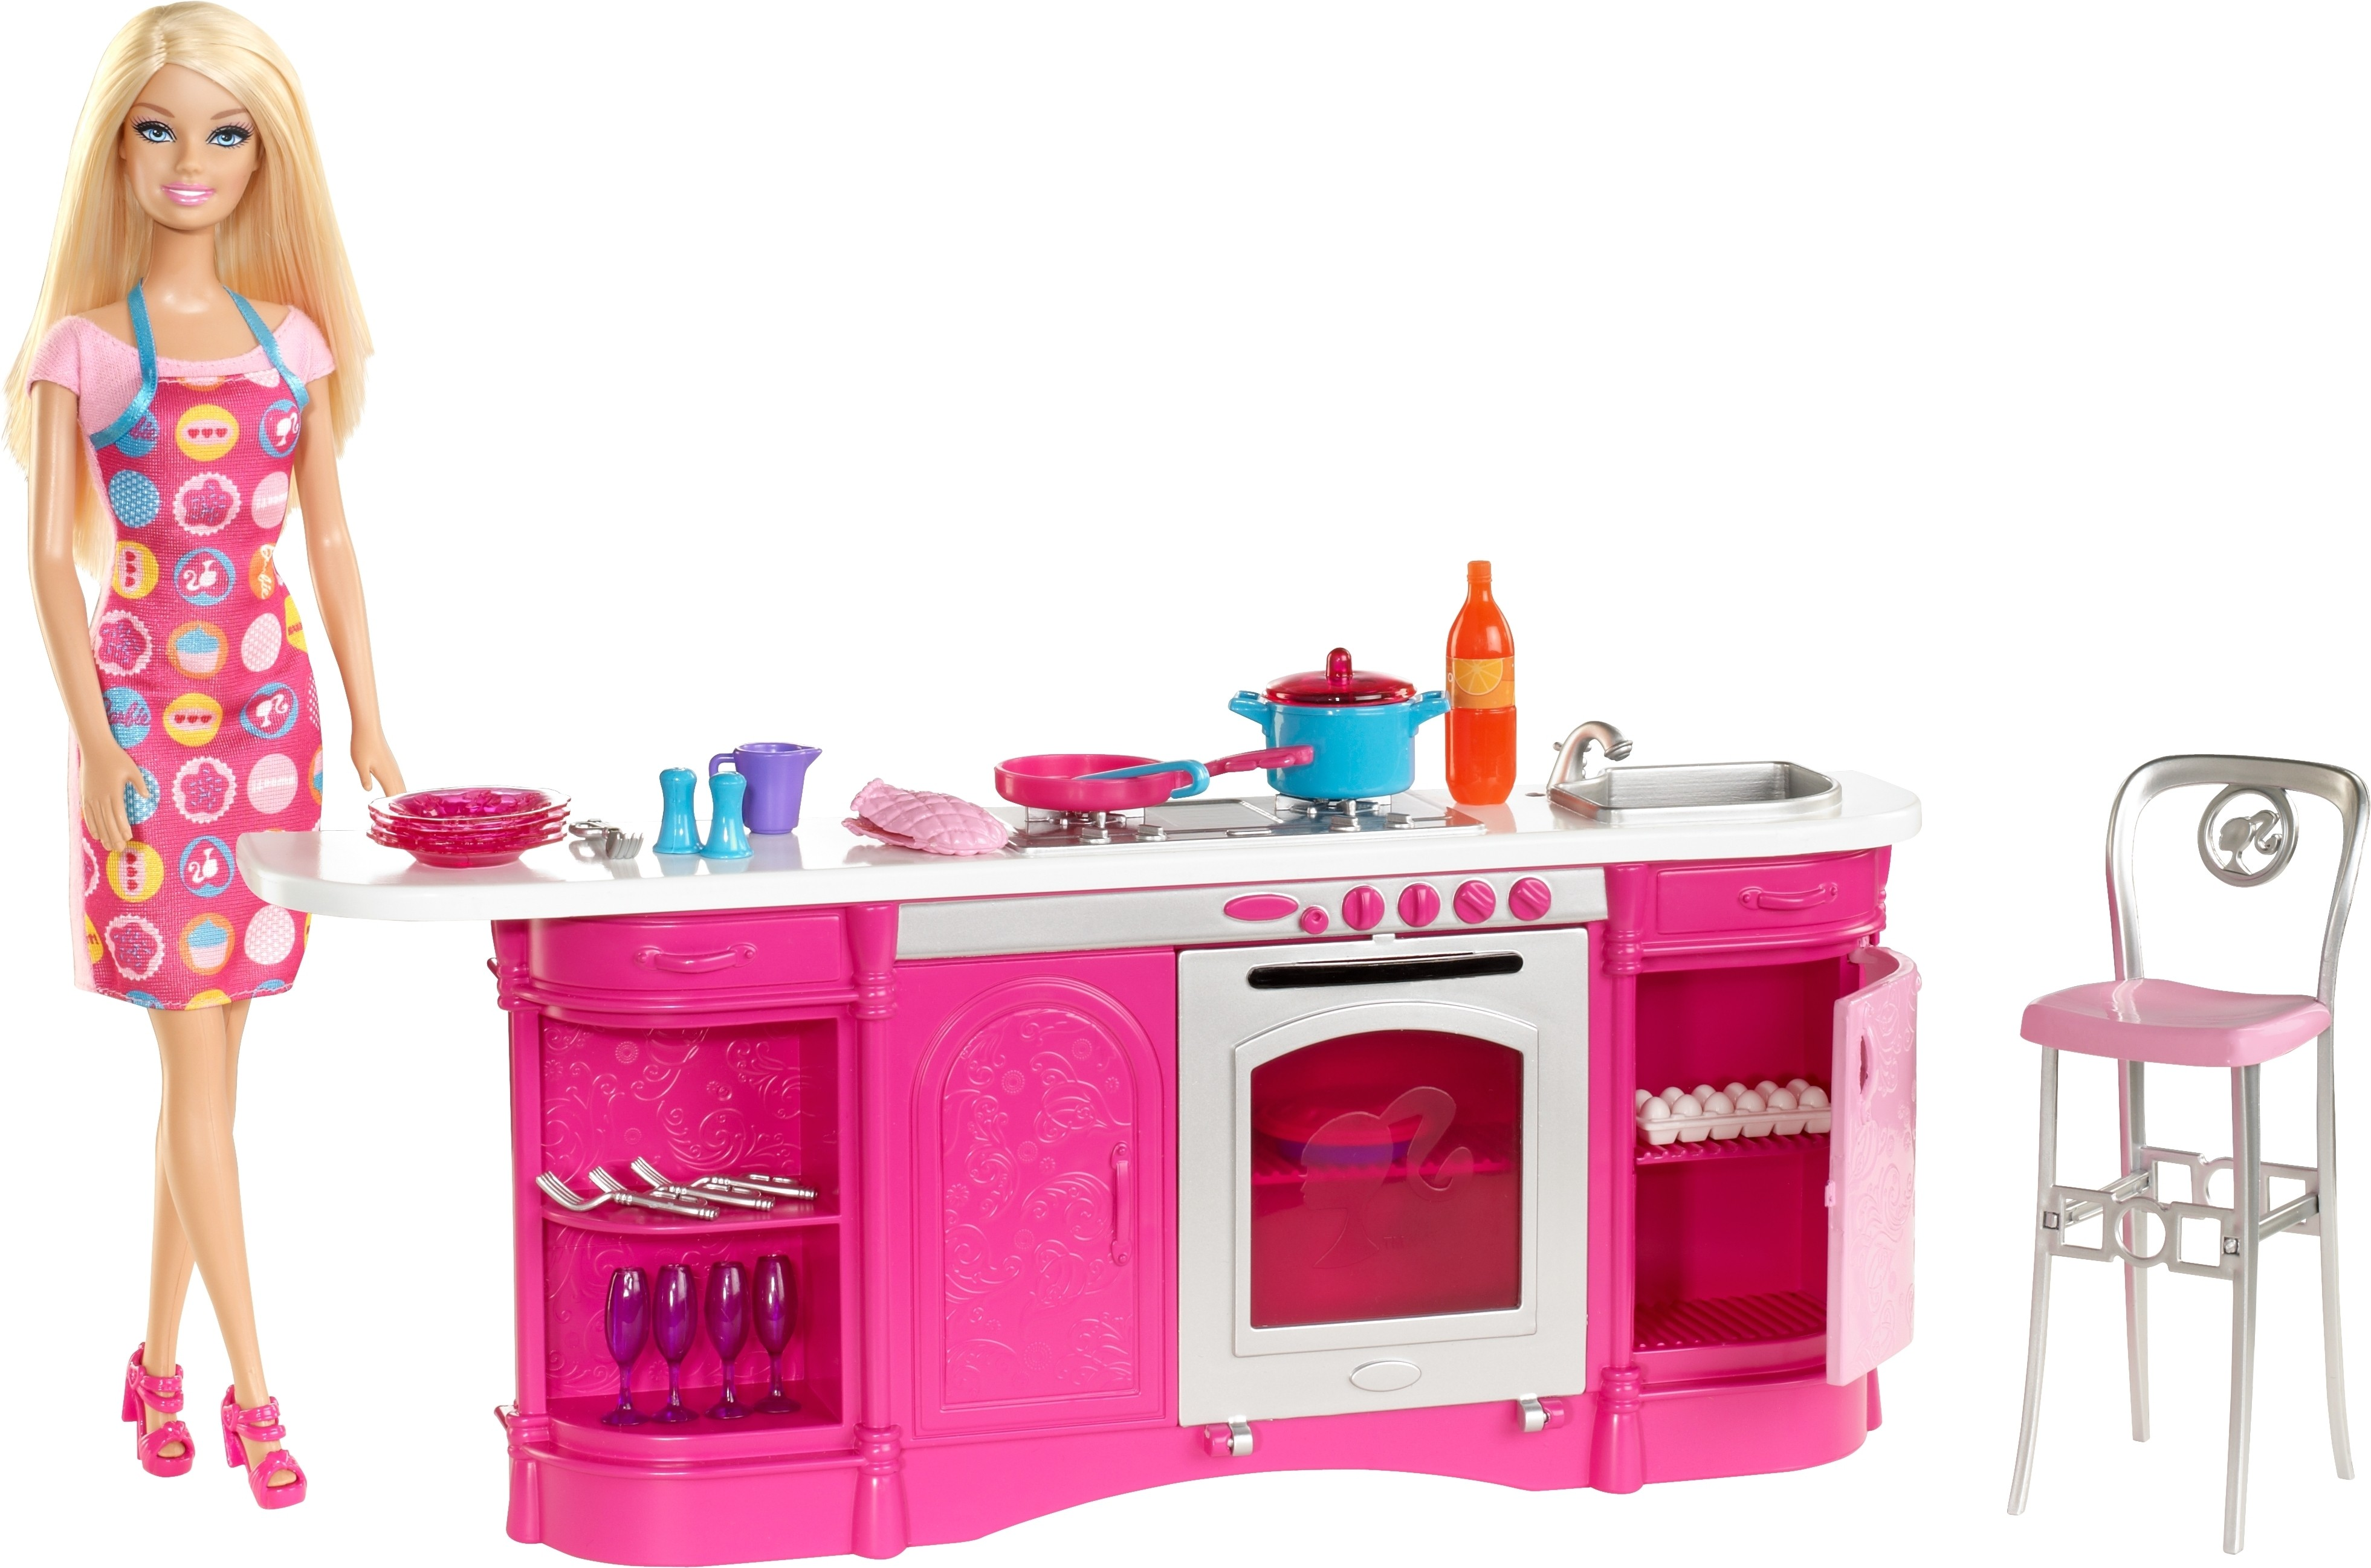 Barbie cooking fun kitchen cooking fun kitchen shop for Kitchen set doll